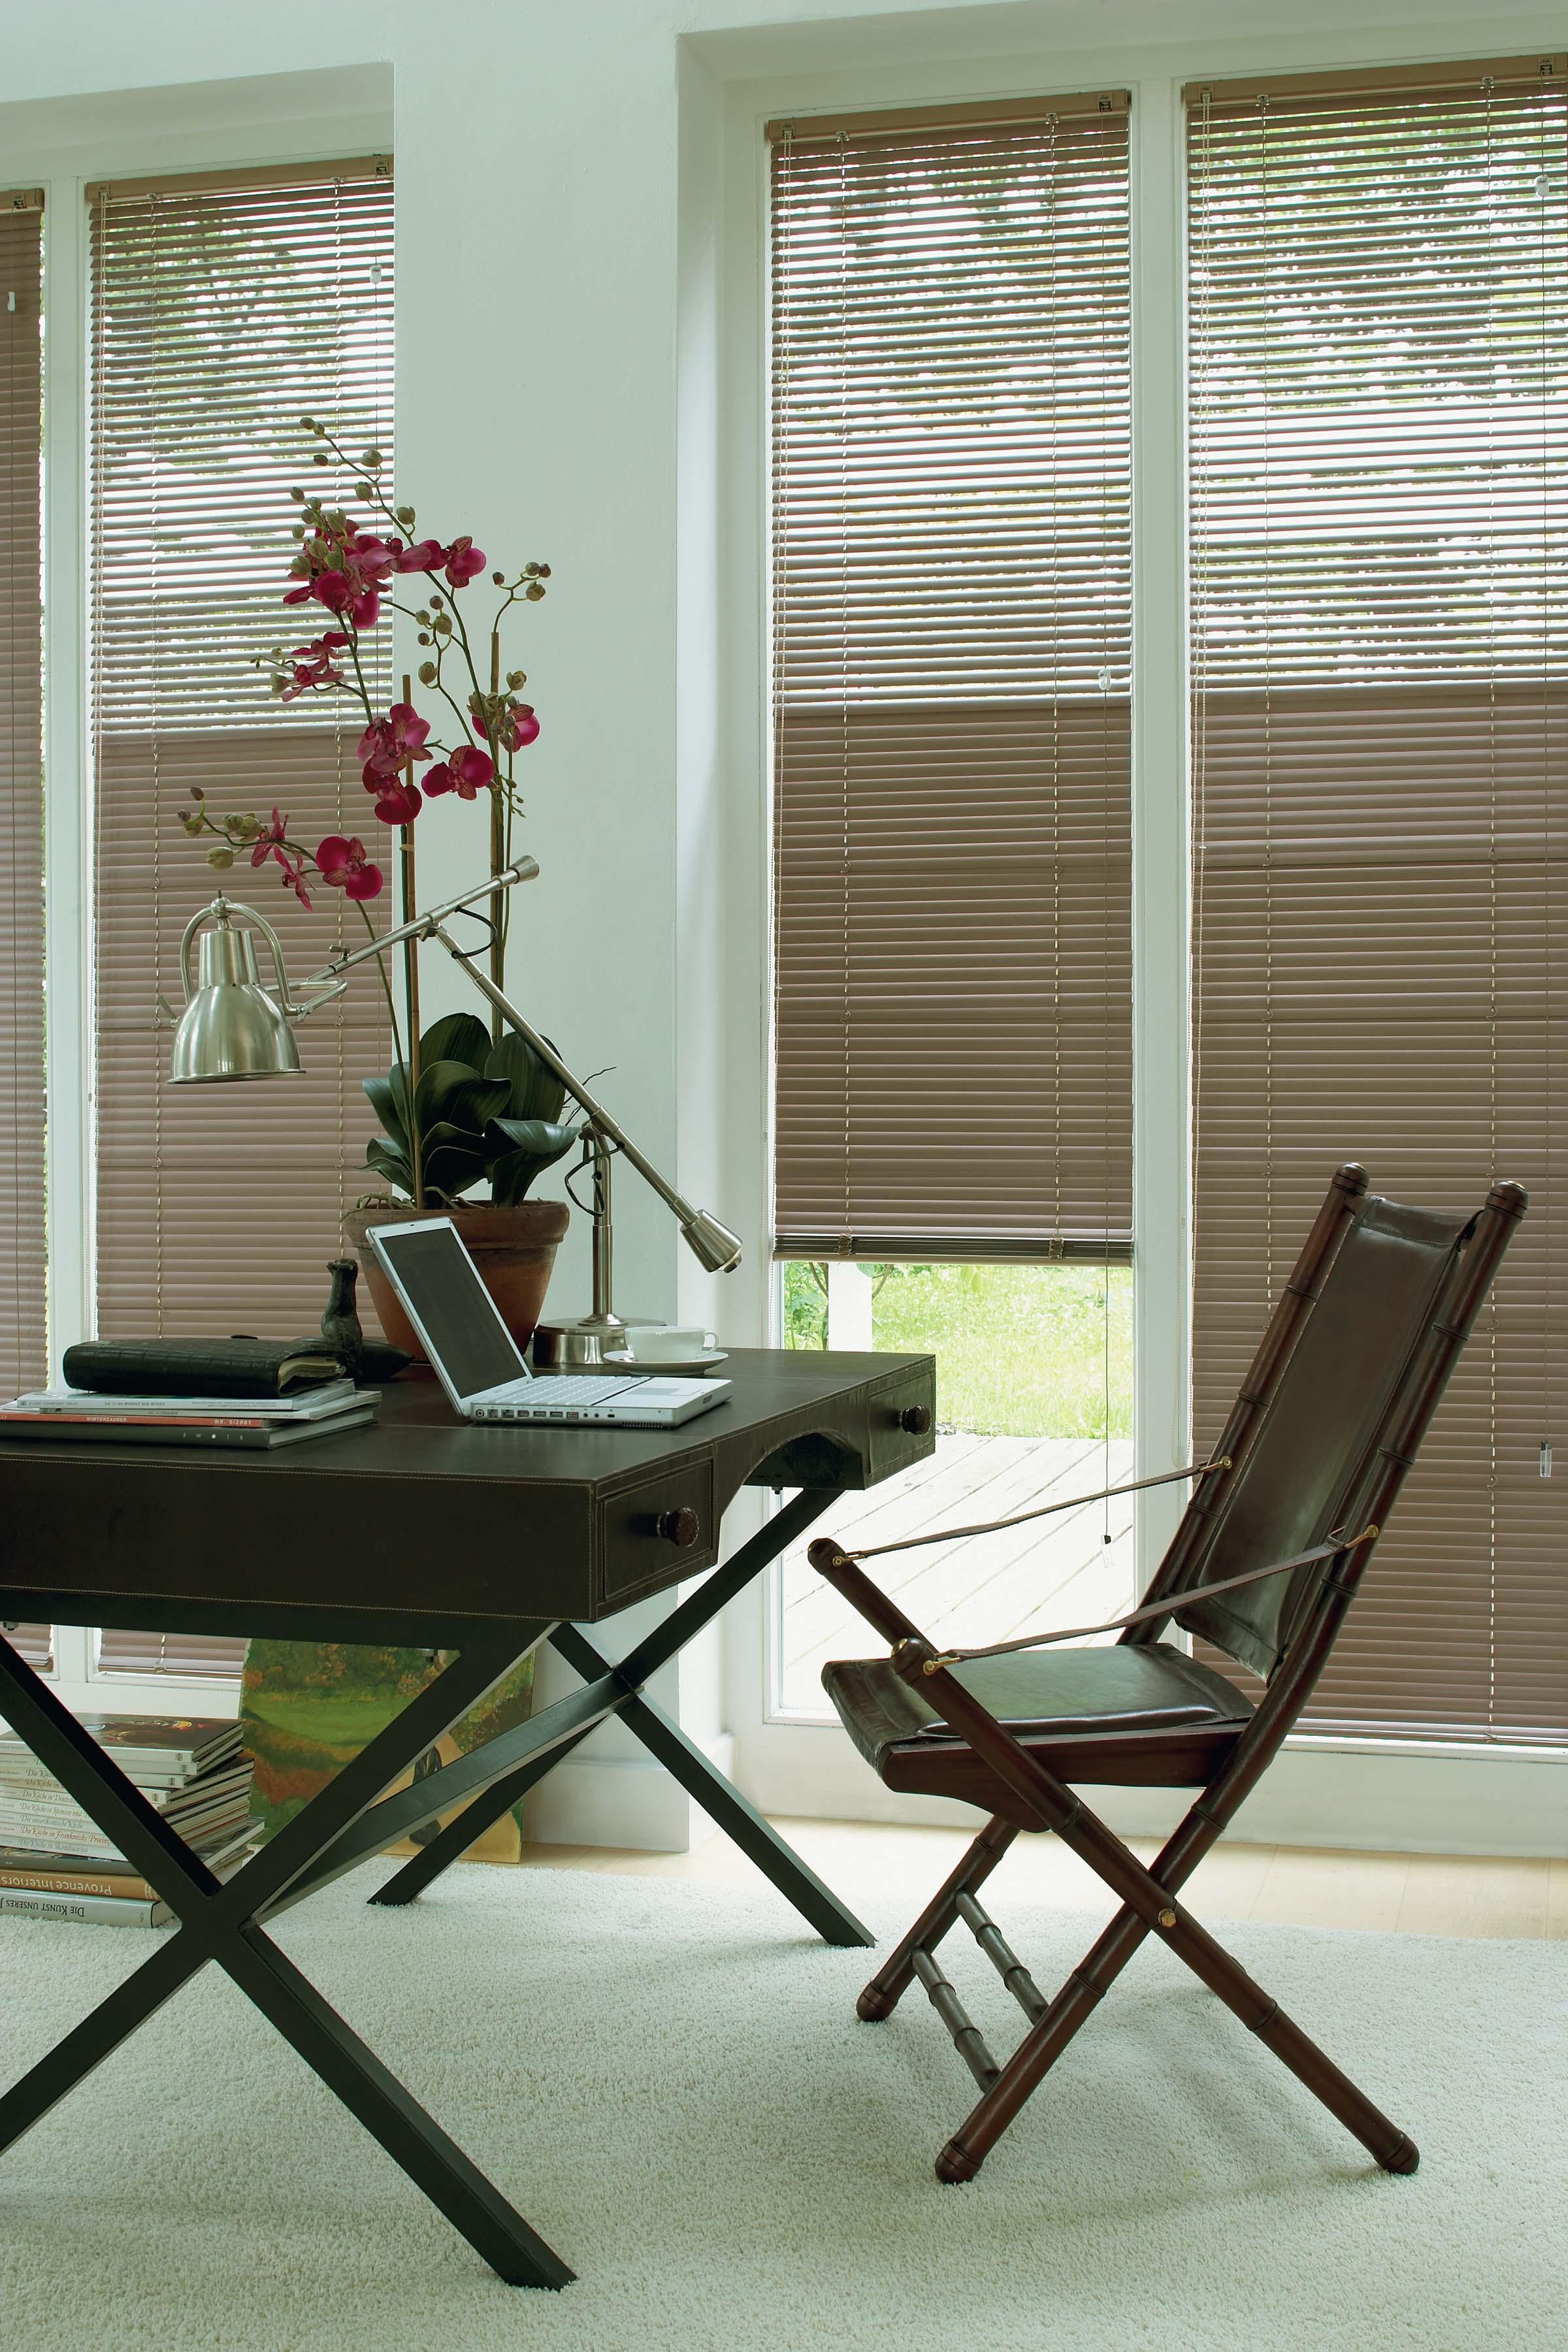 New York Venetian blinds closed